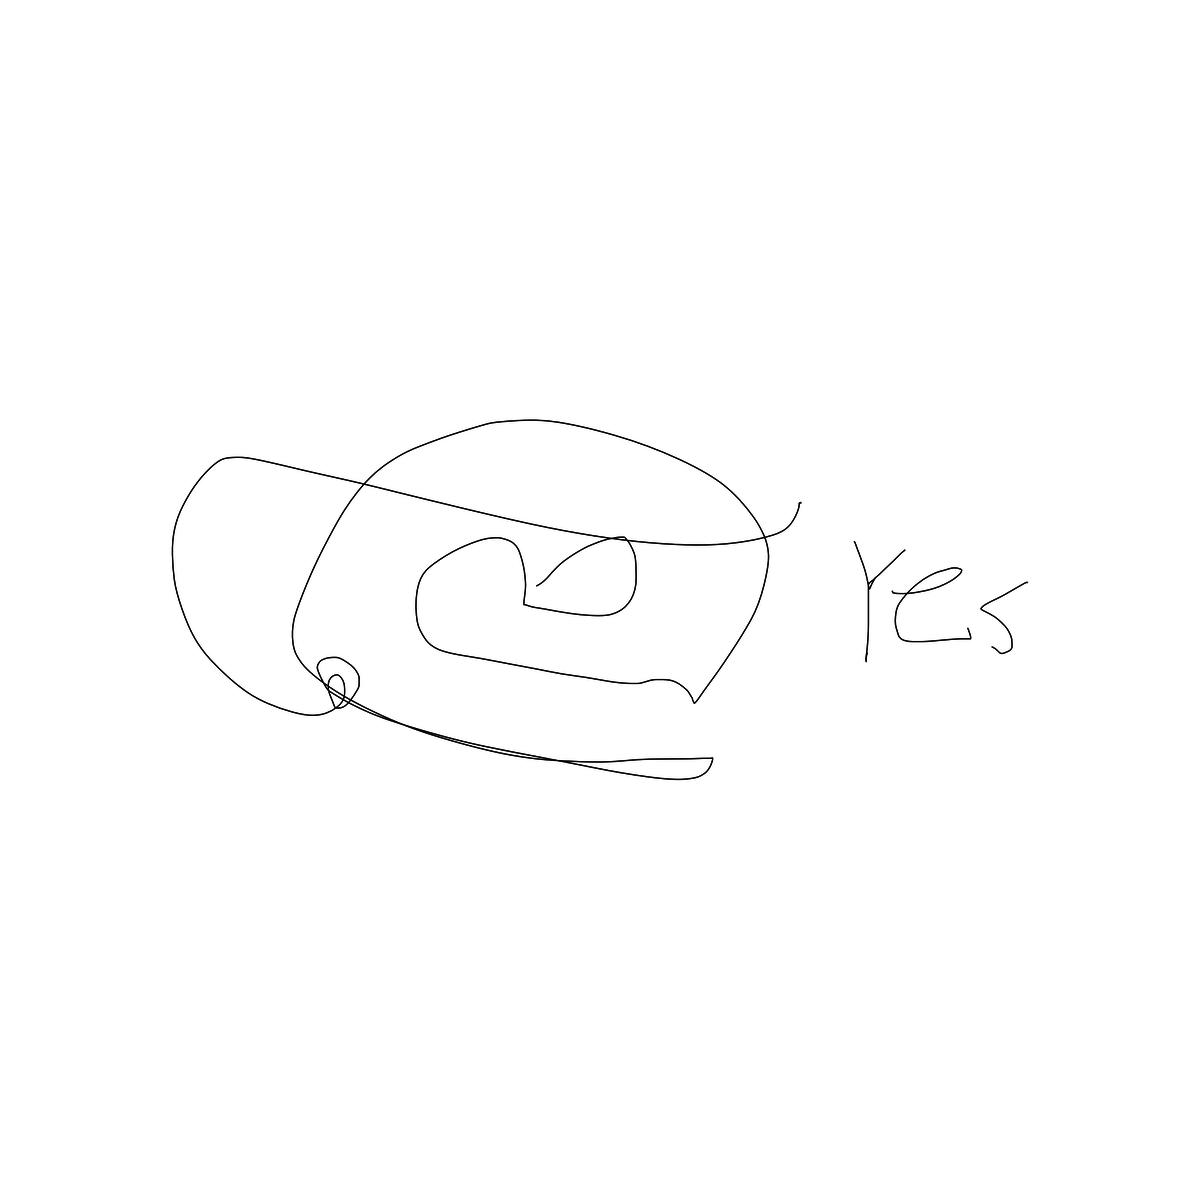 BAAAM drawing#24648 lat:52.6963653564453100lng: 38.3202972412109400